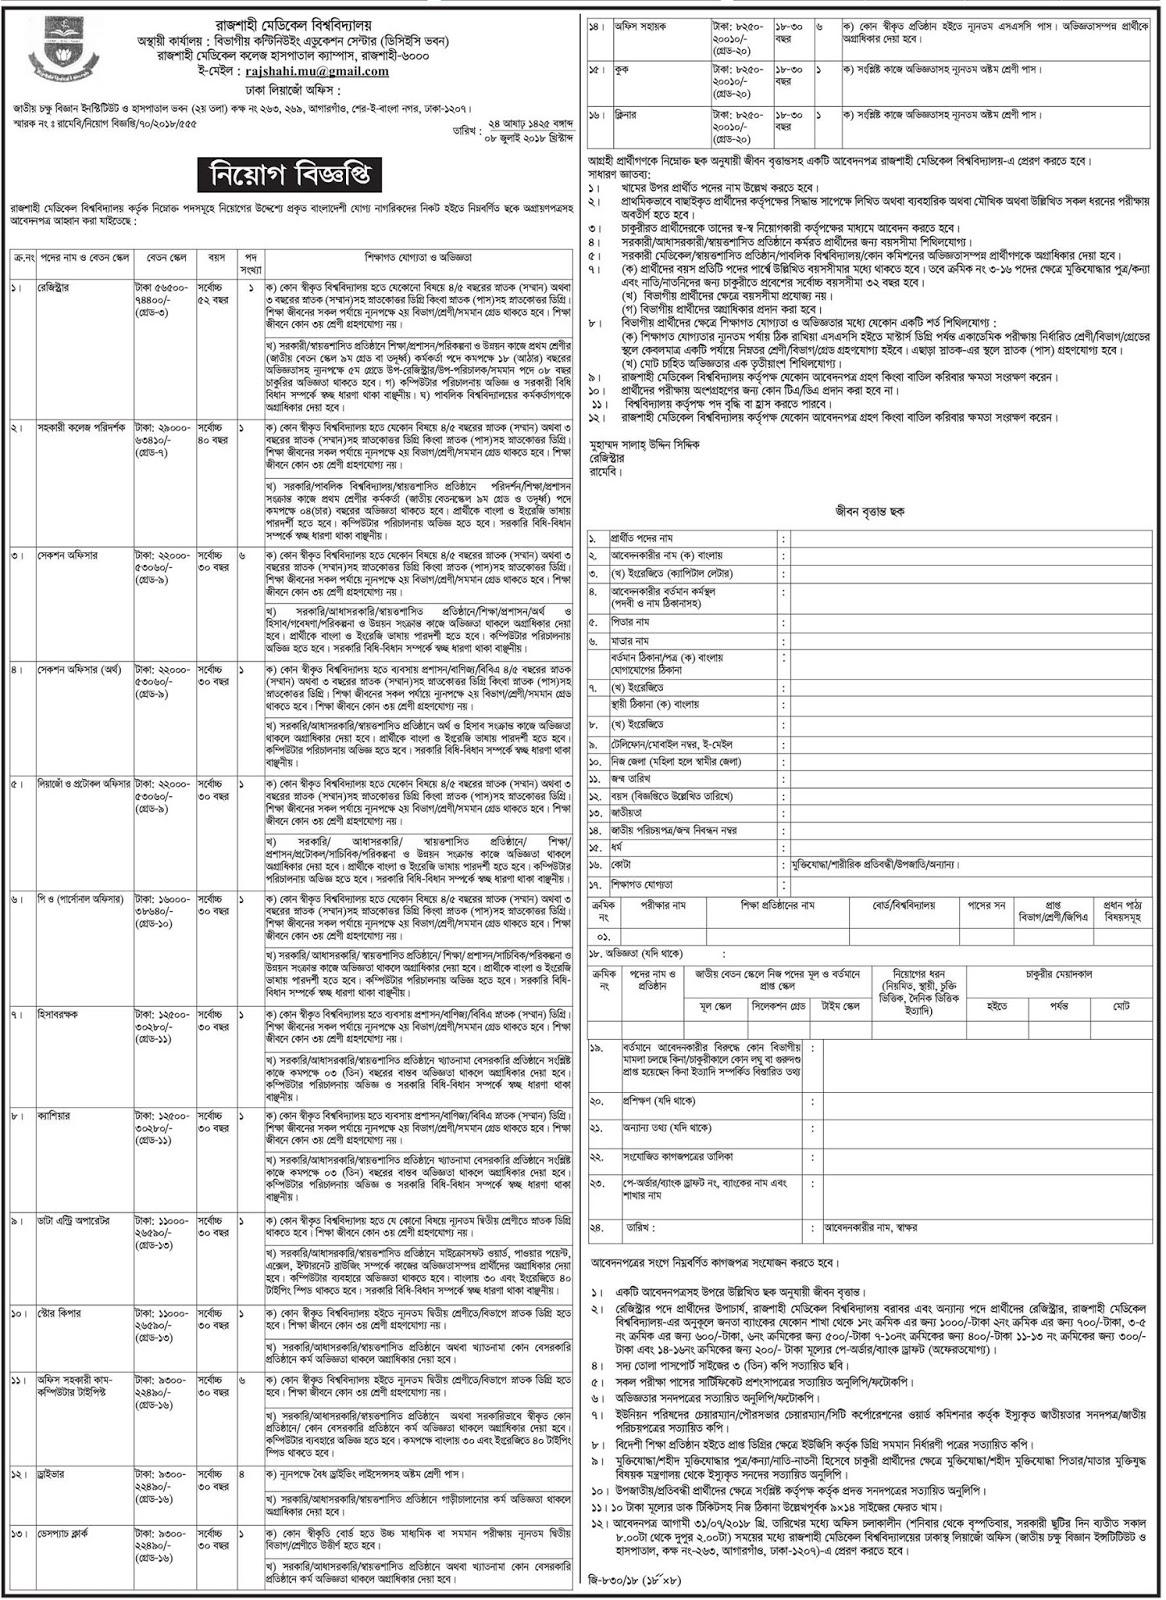 Rajshahi Medical University Recruitment Circular 2018